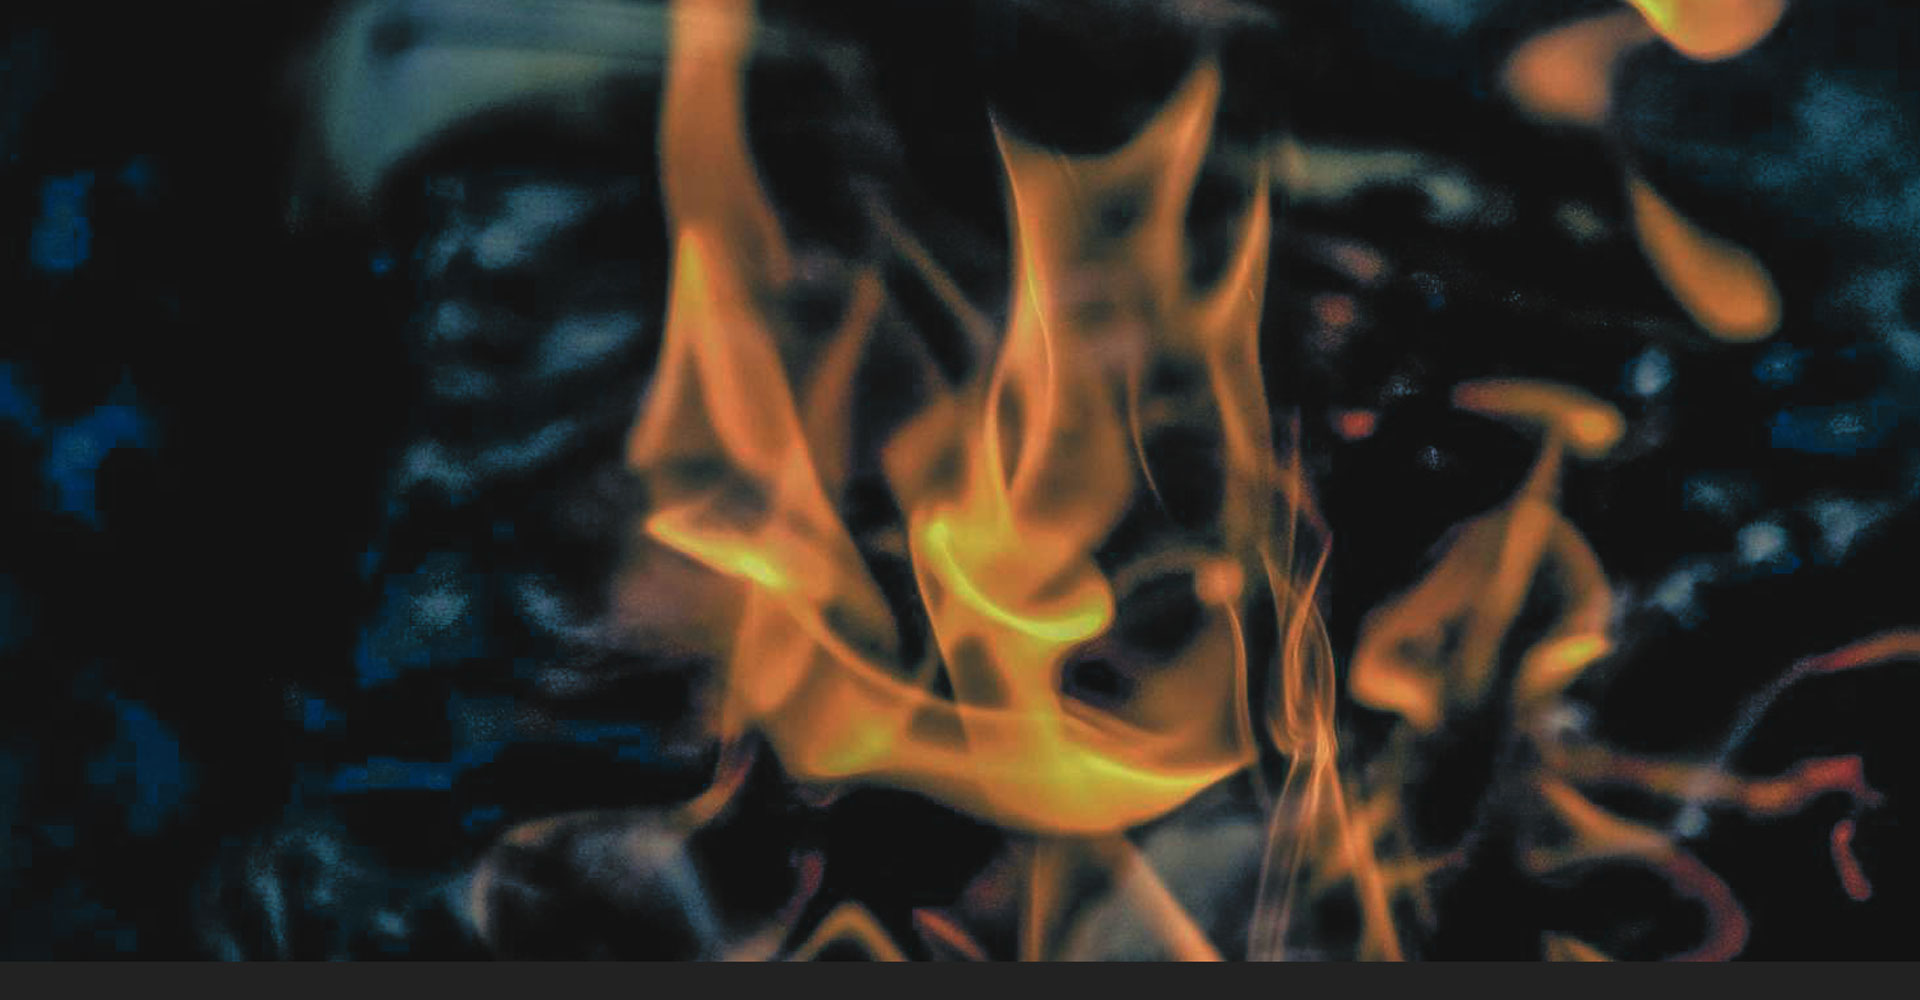 Certificazione EAC antincendio